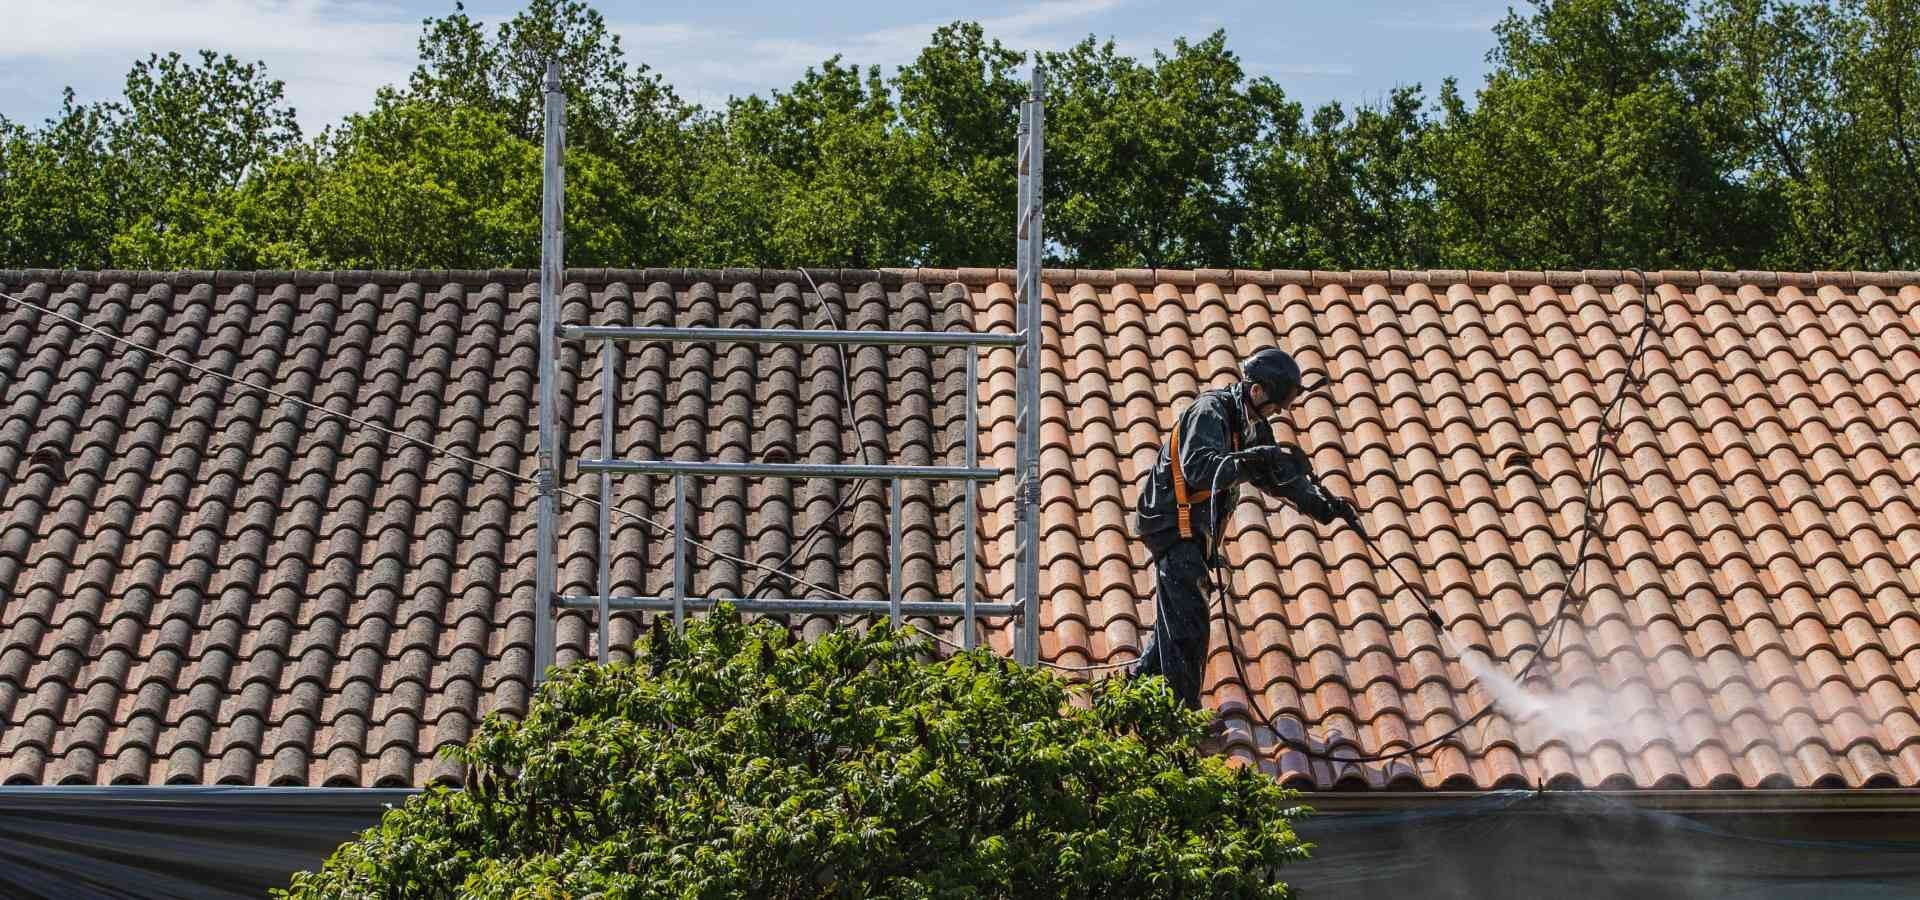 renovation toiture technitoit